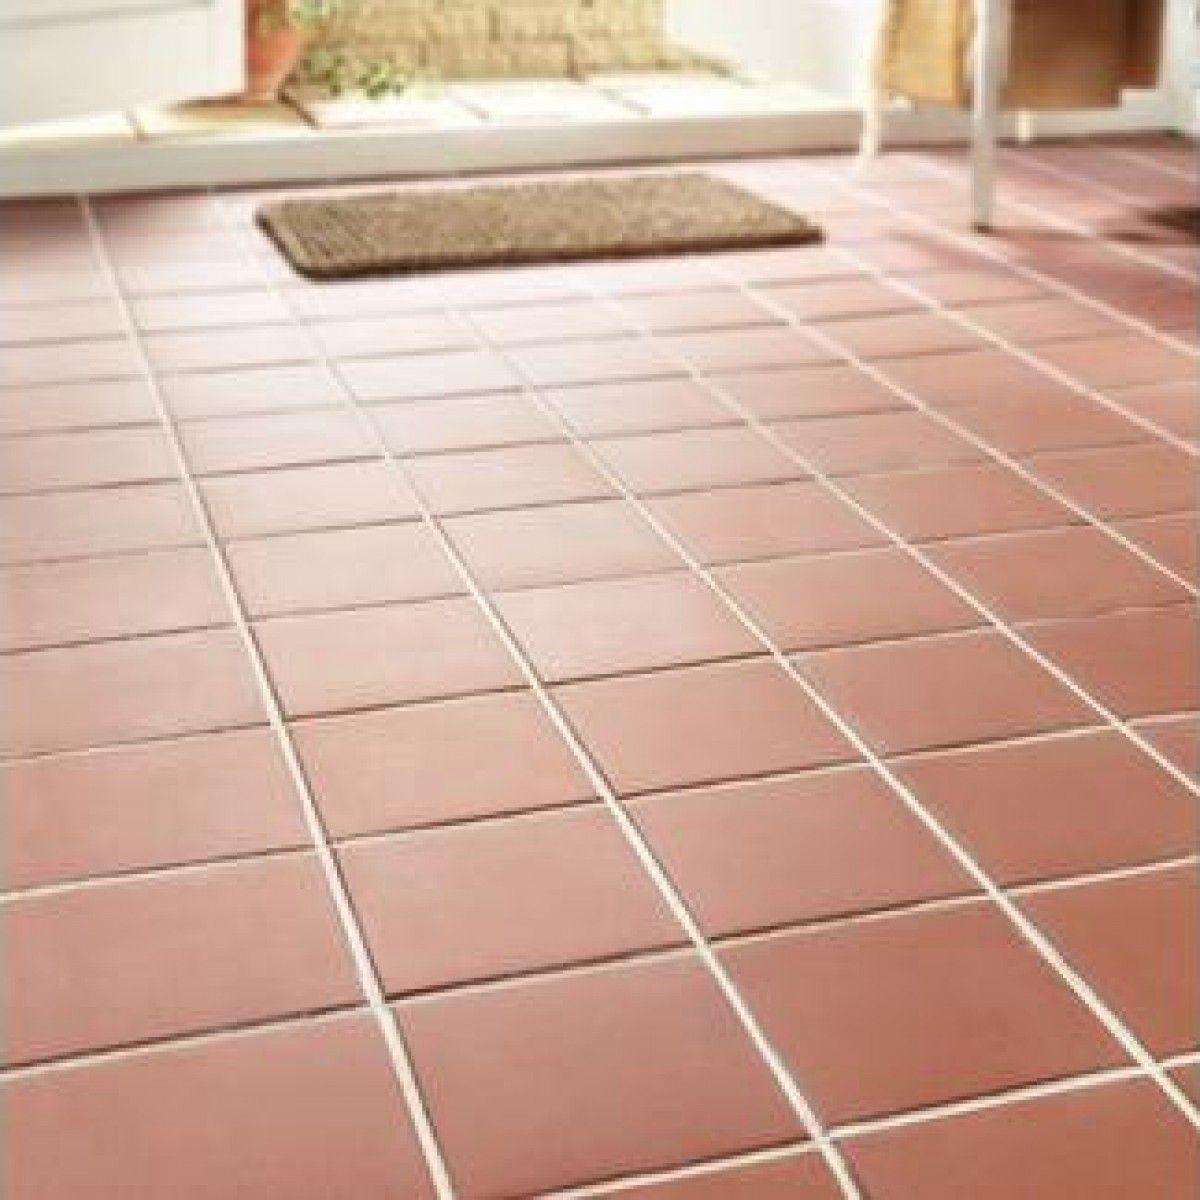 Sima red quarry floor tile quarry tiled floors pinterest sima red quarry floor tile dailygadgetfo Choice Image